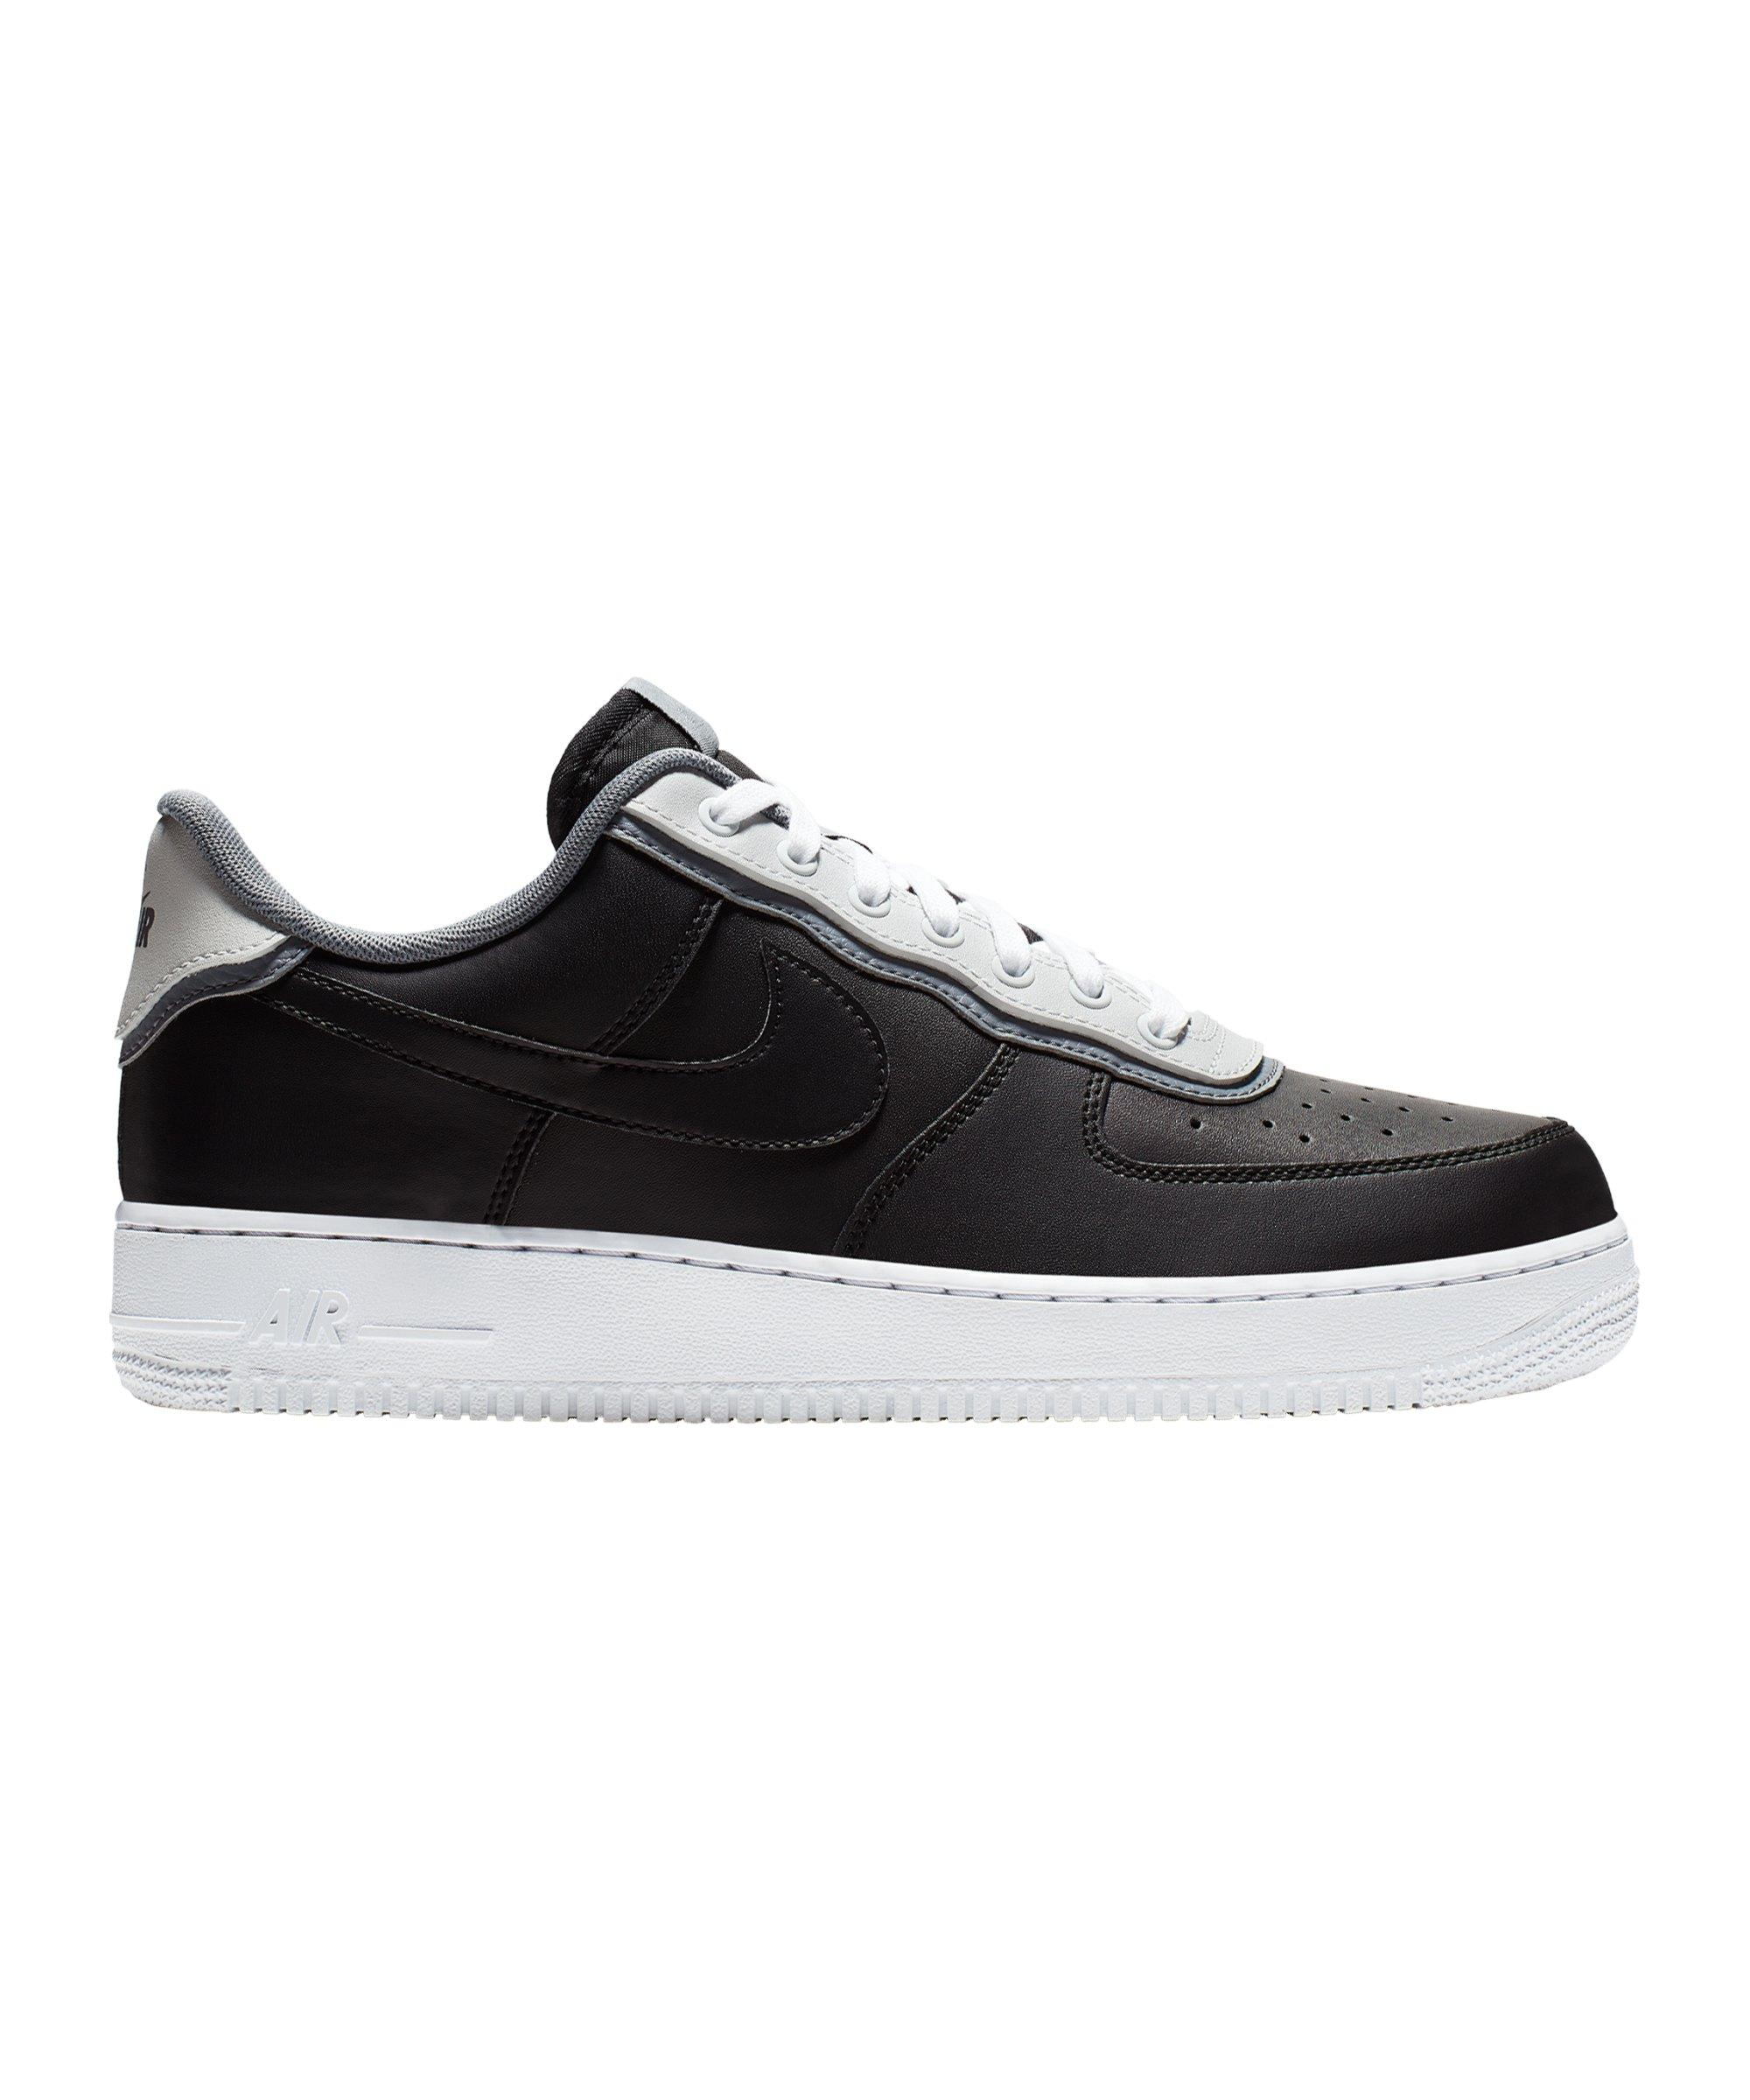 newest cf20d 53c67 Nike Air Force 1 07 LV8 Sneaker Schwarz Grau F002 - Schwarz